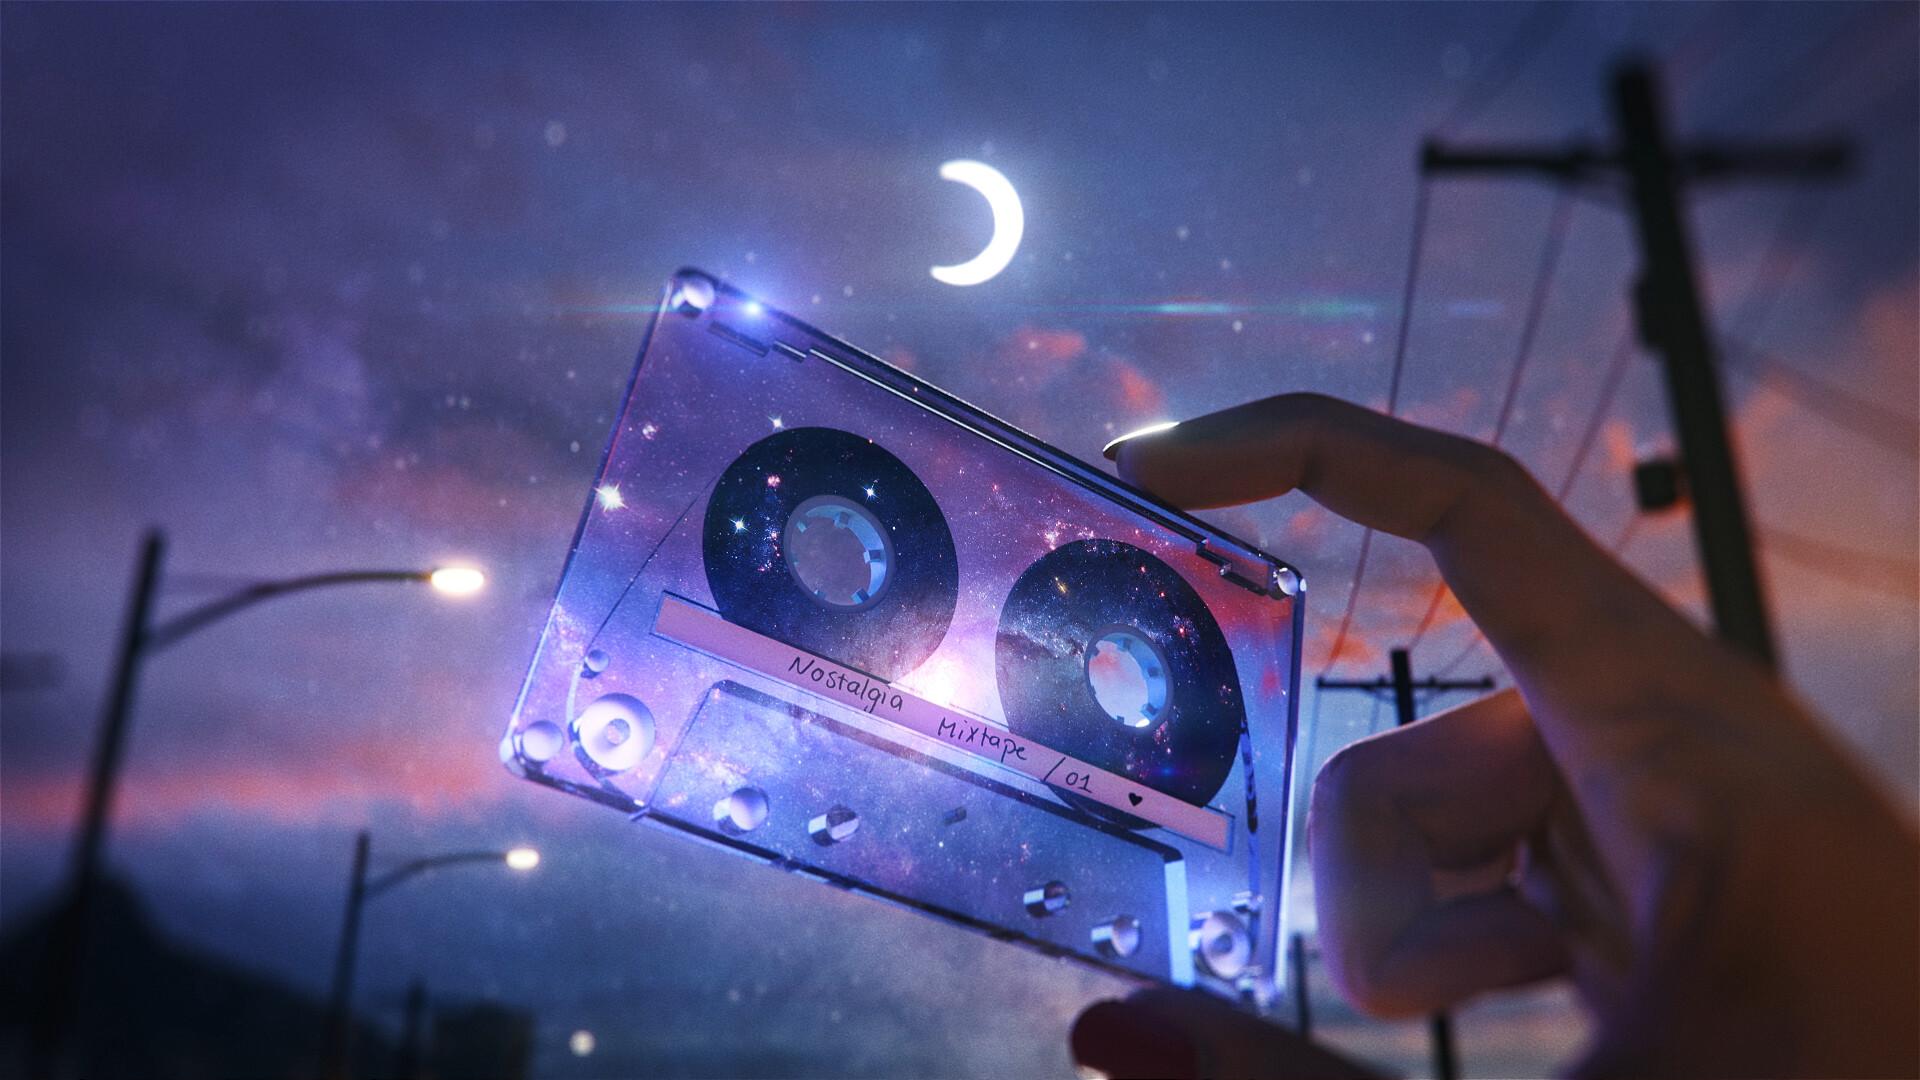 General 1920x1080 artwork tape Moon night space stars